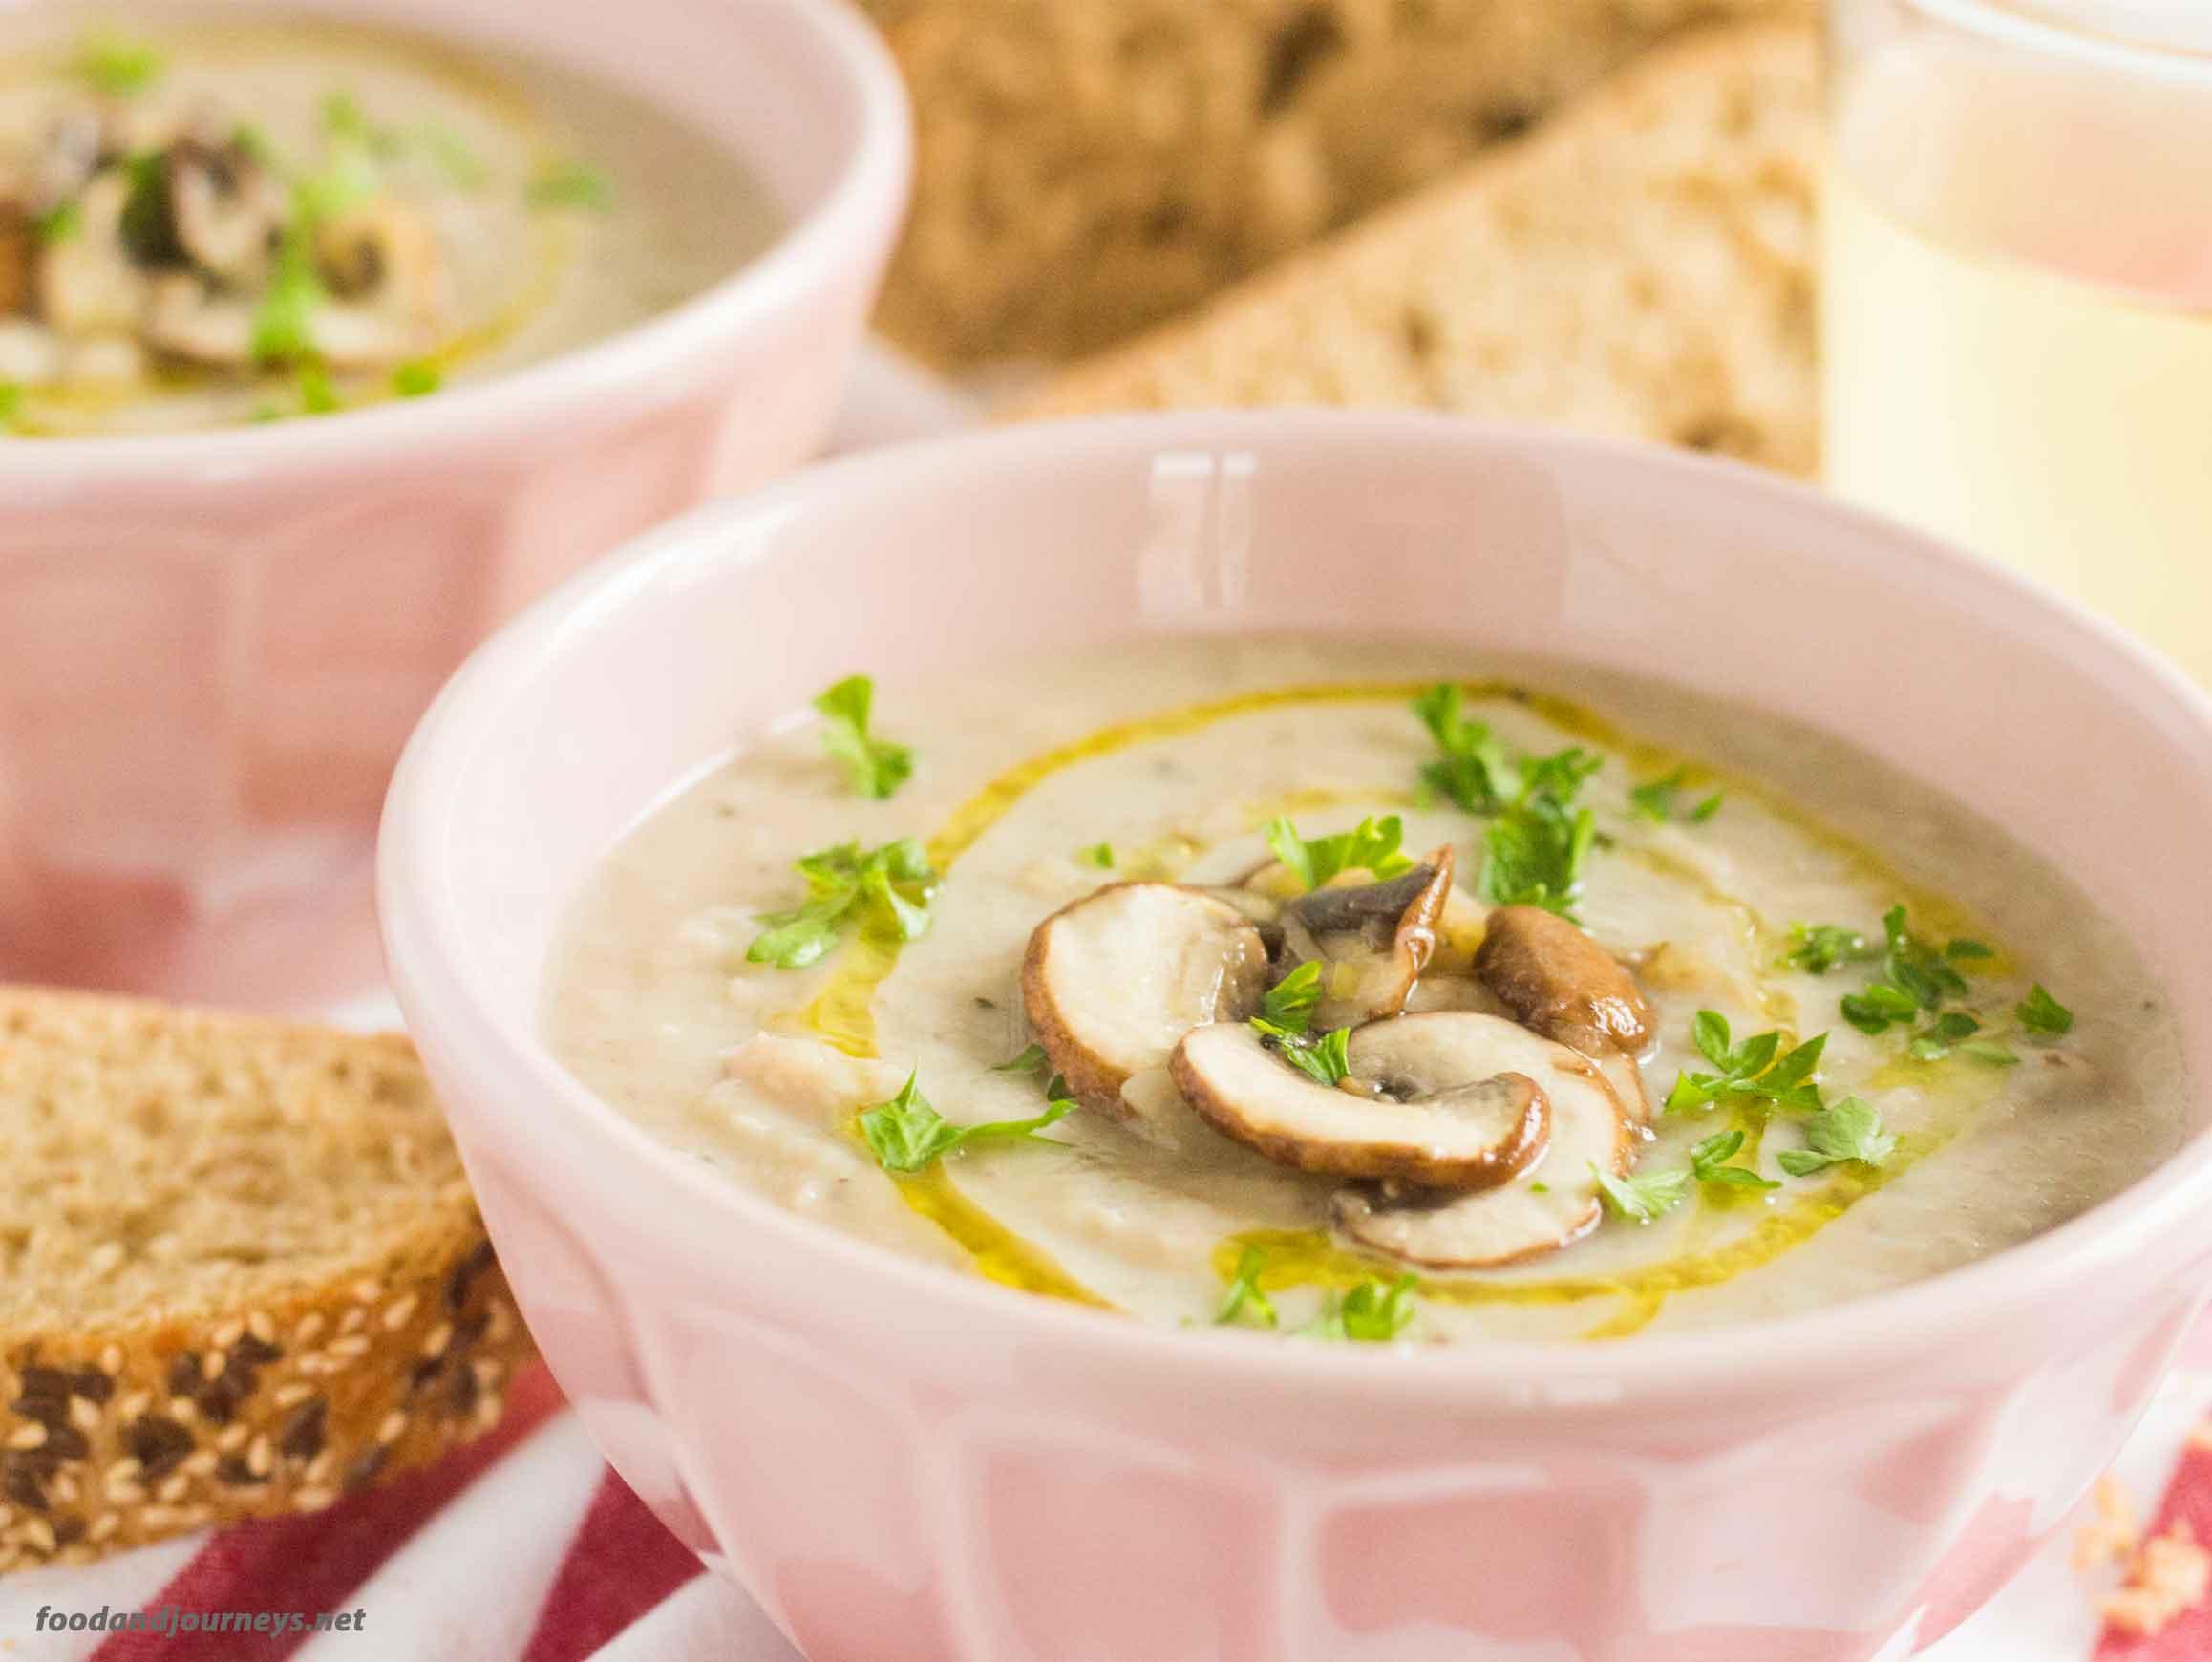 Cream of Beans & Mushrooms Soup MPIC|foodandjourneys.net